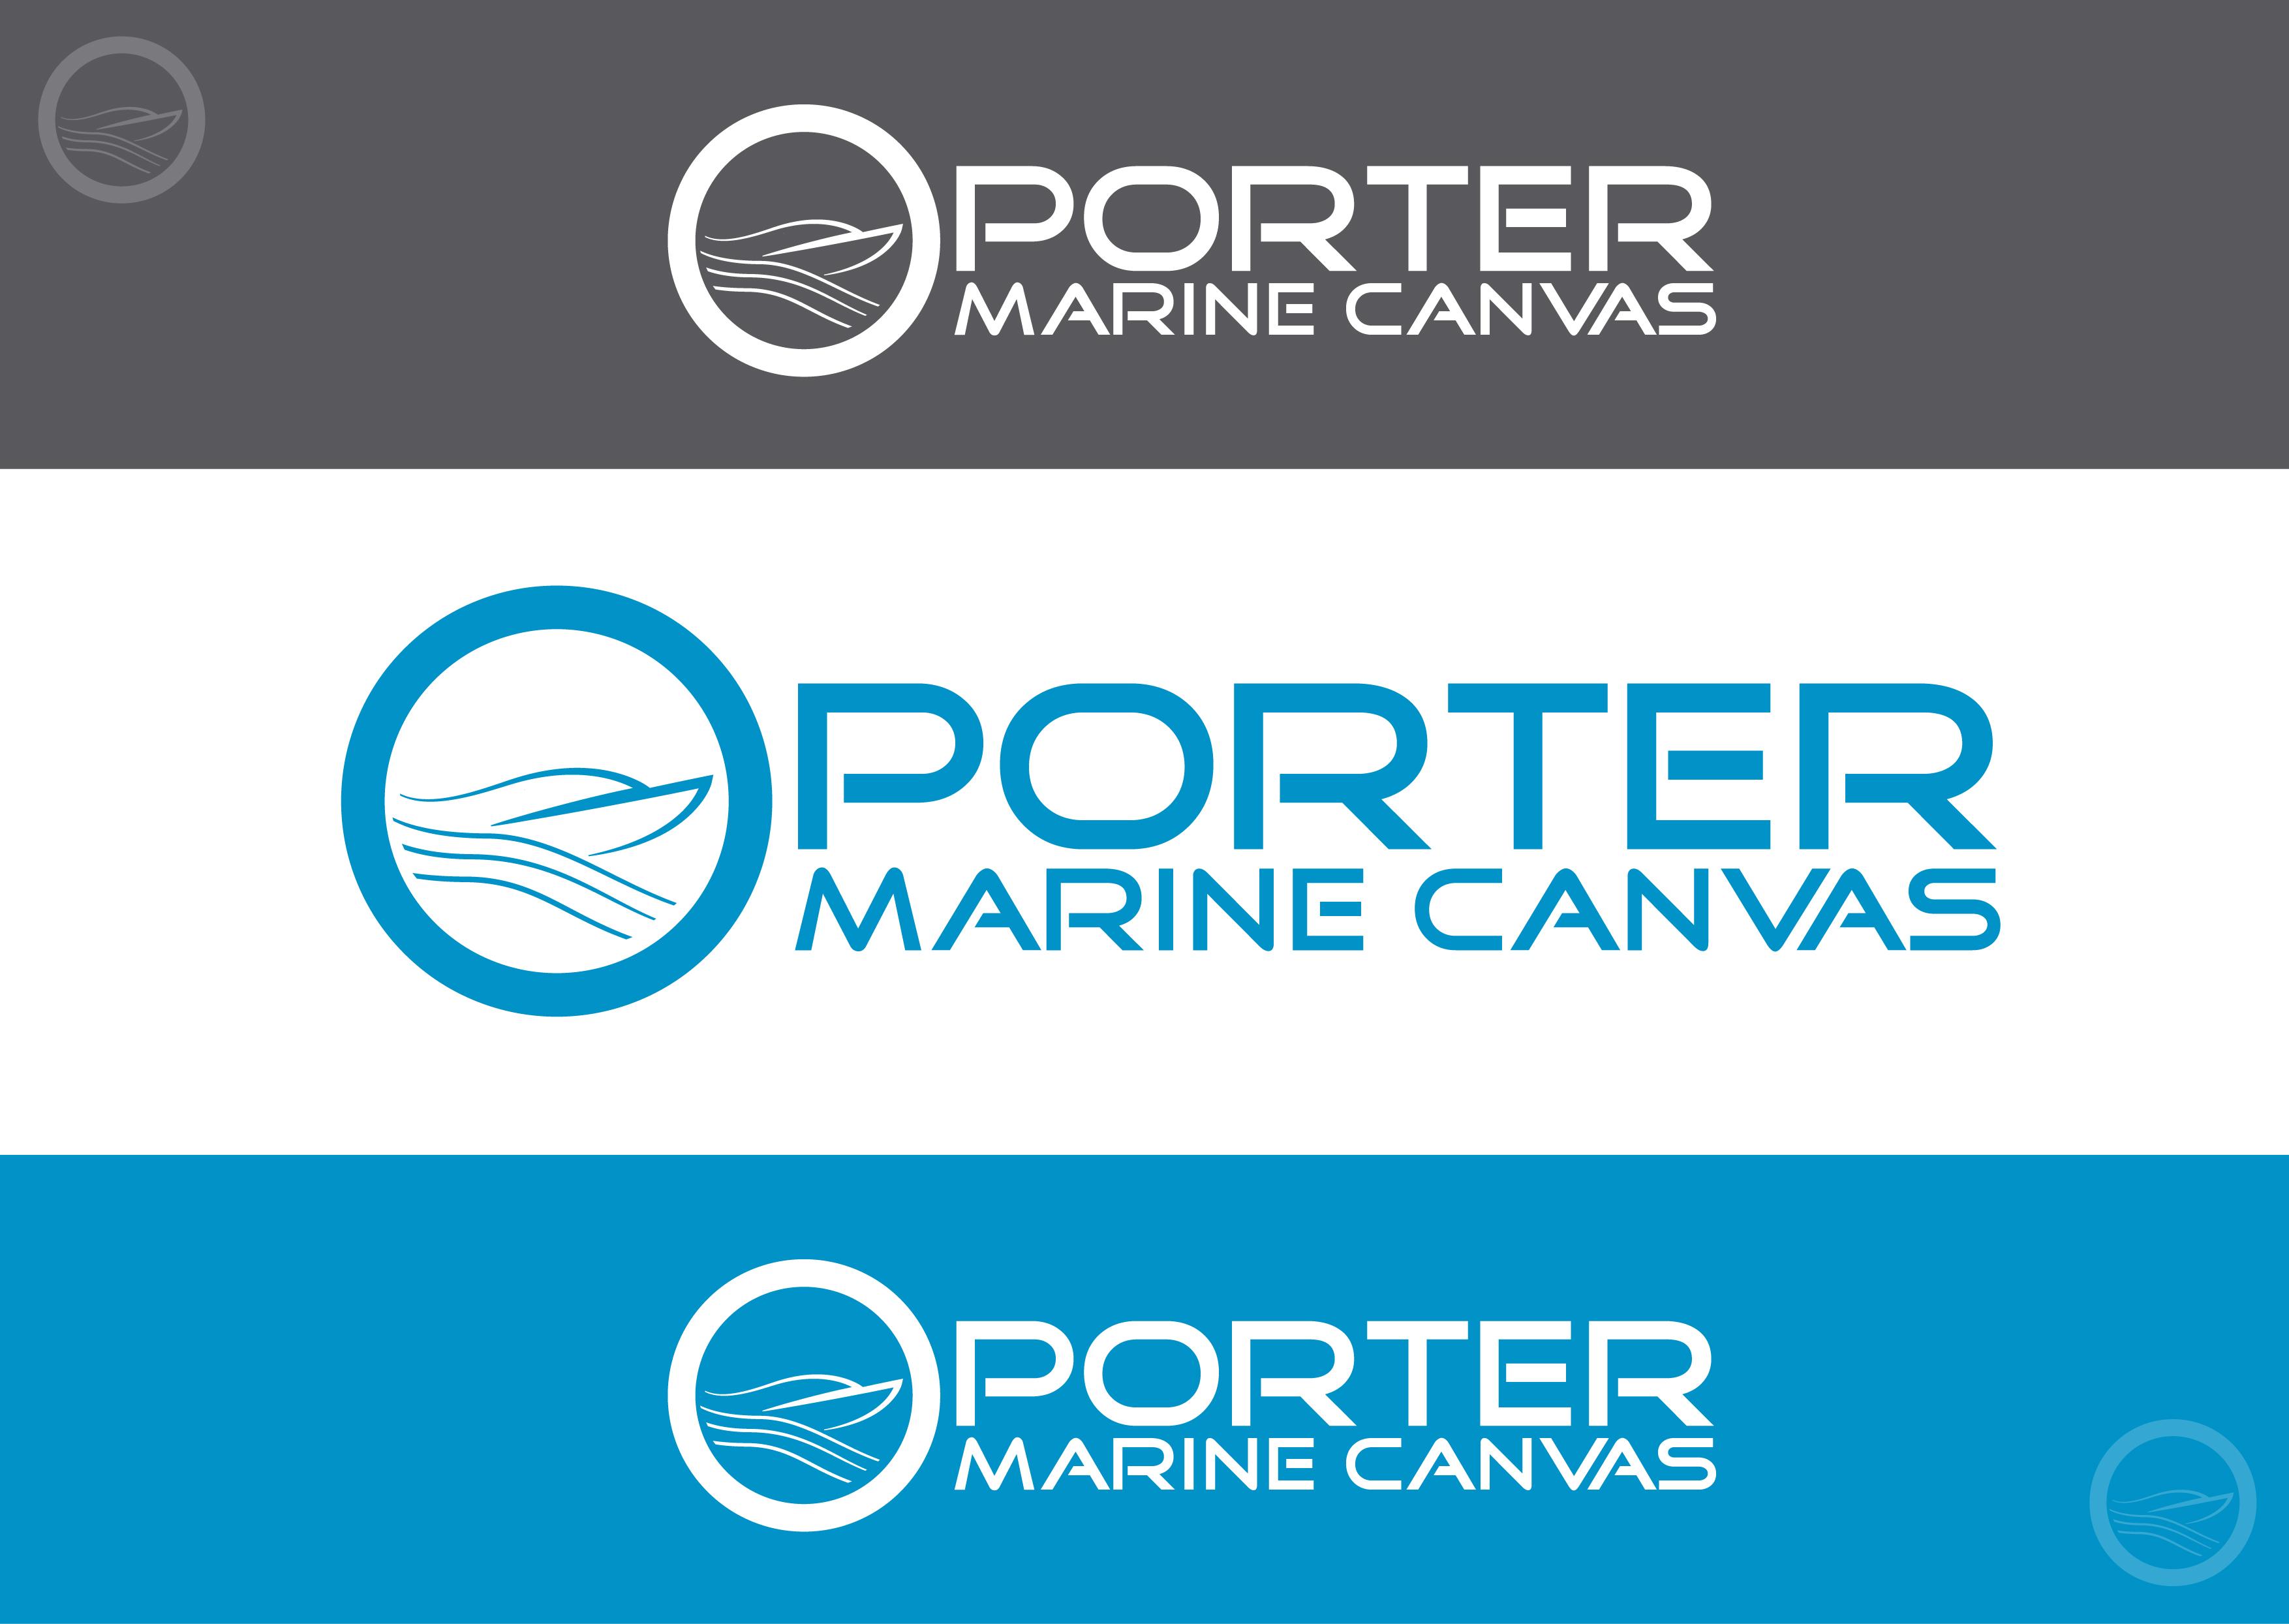 Logo Design by 3draw - Entry No. 228 in the Logo Design Contest Imaginative Logo Design for Porter Marine Canvas.